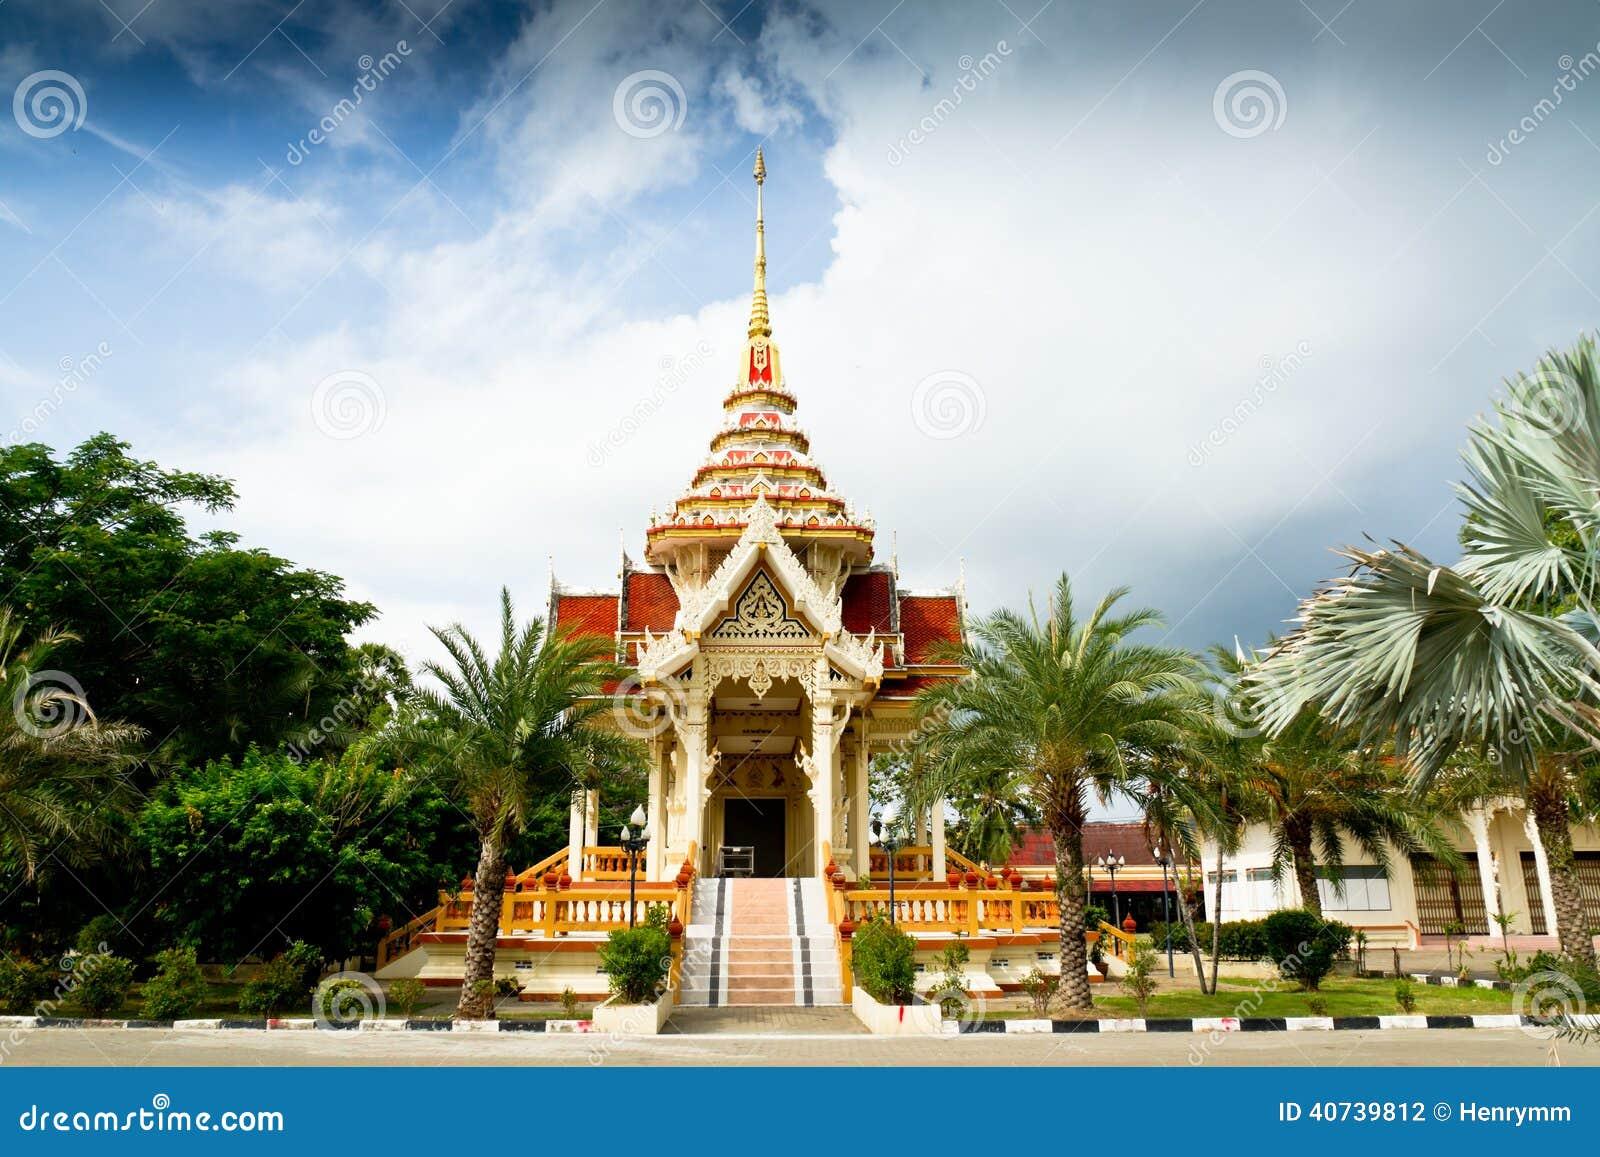 Wat Chalong Temple, Phuket, Thailand.